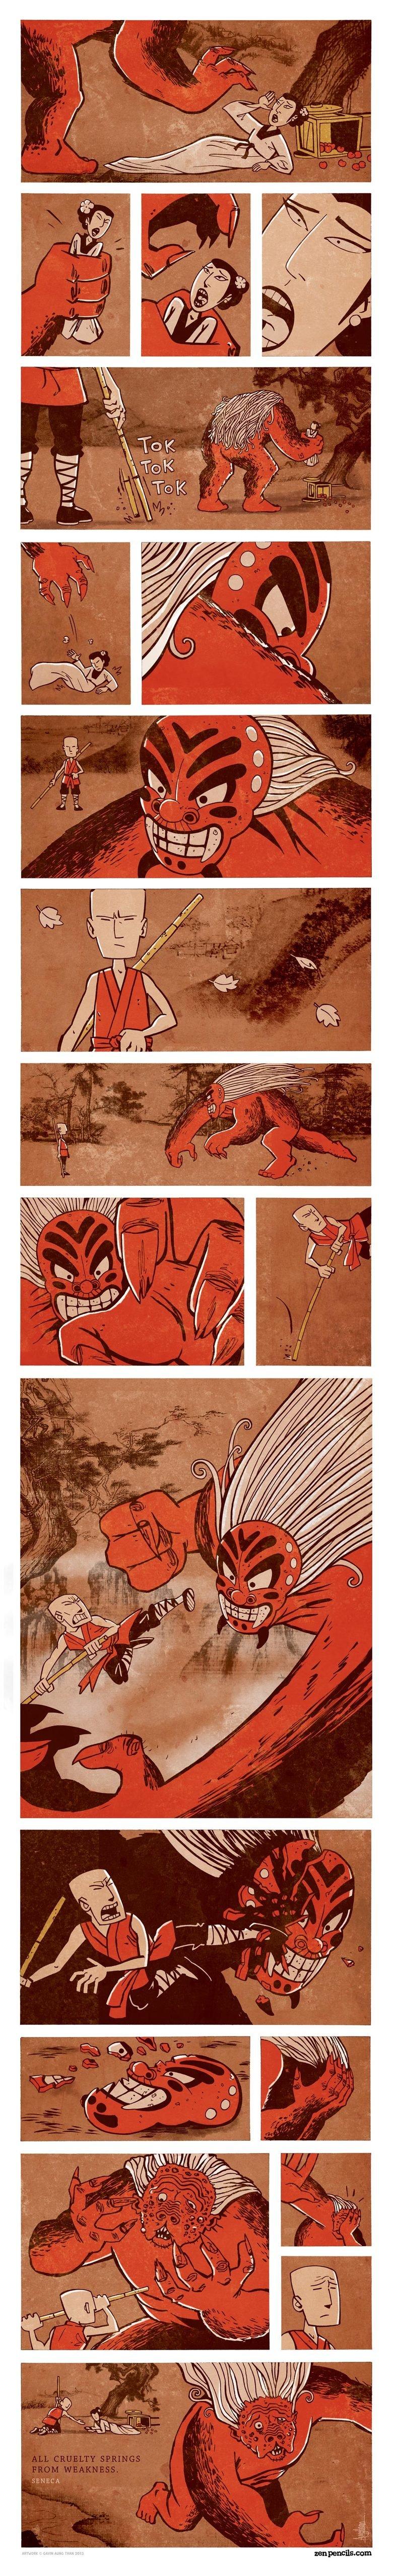 Devils. zenpencils.com/.. kinda looks like Master Monk Guan zen